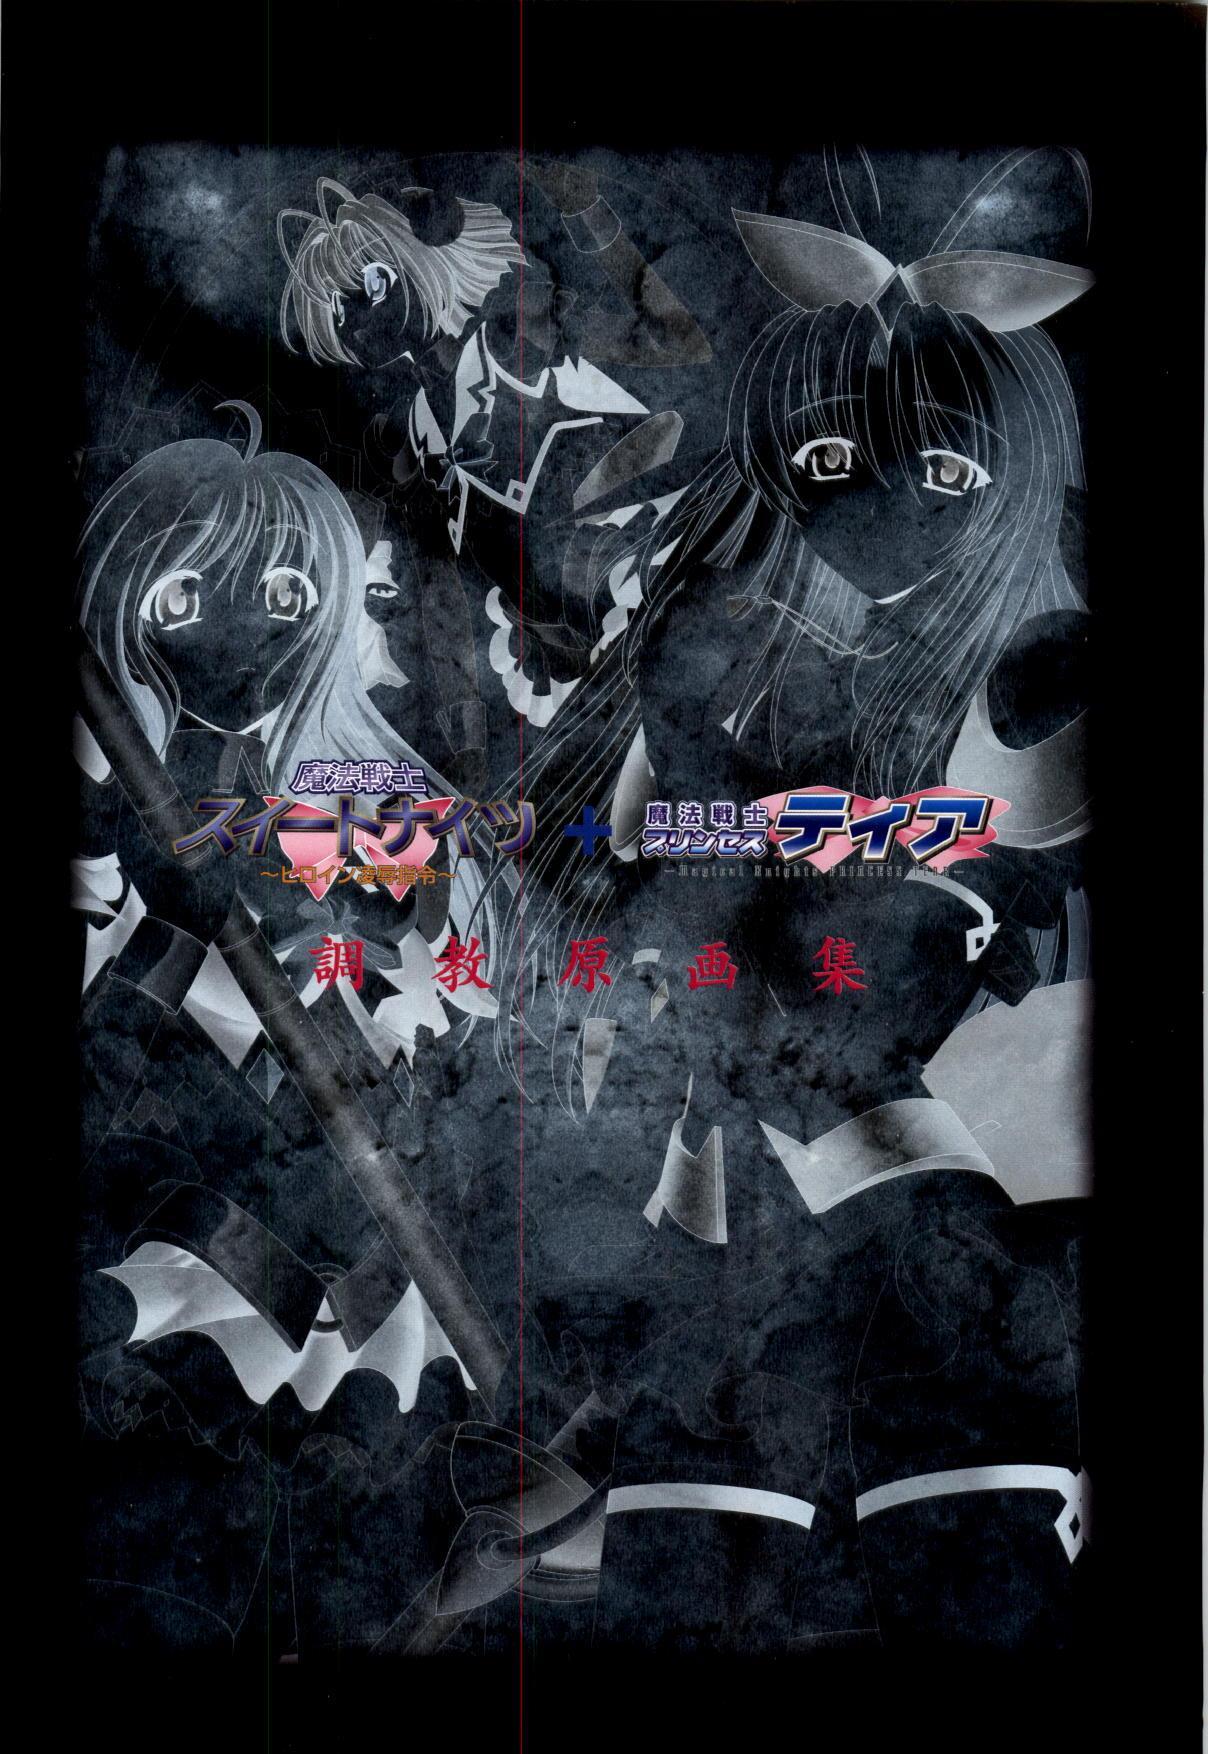 Mahou Senshi Sweet Knight & Mahou Senshi Princess Tear 2